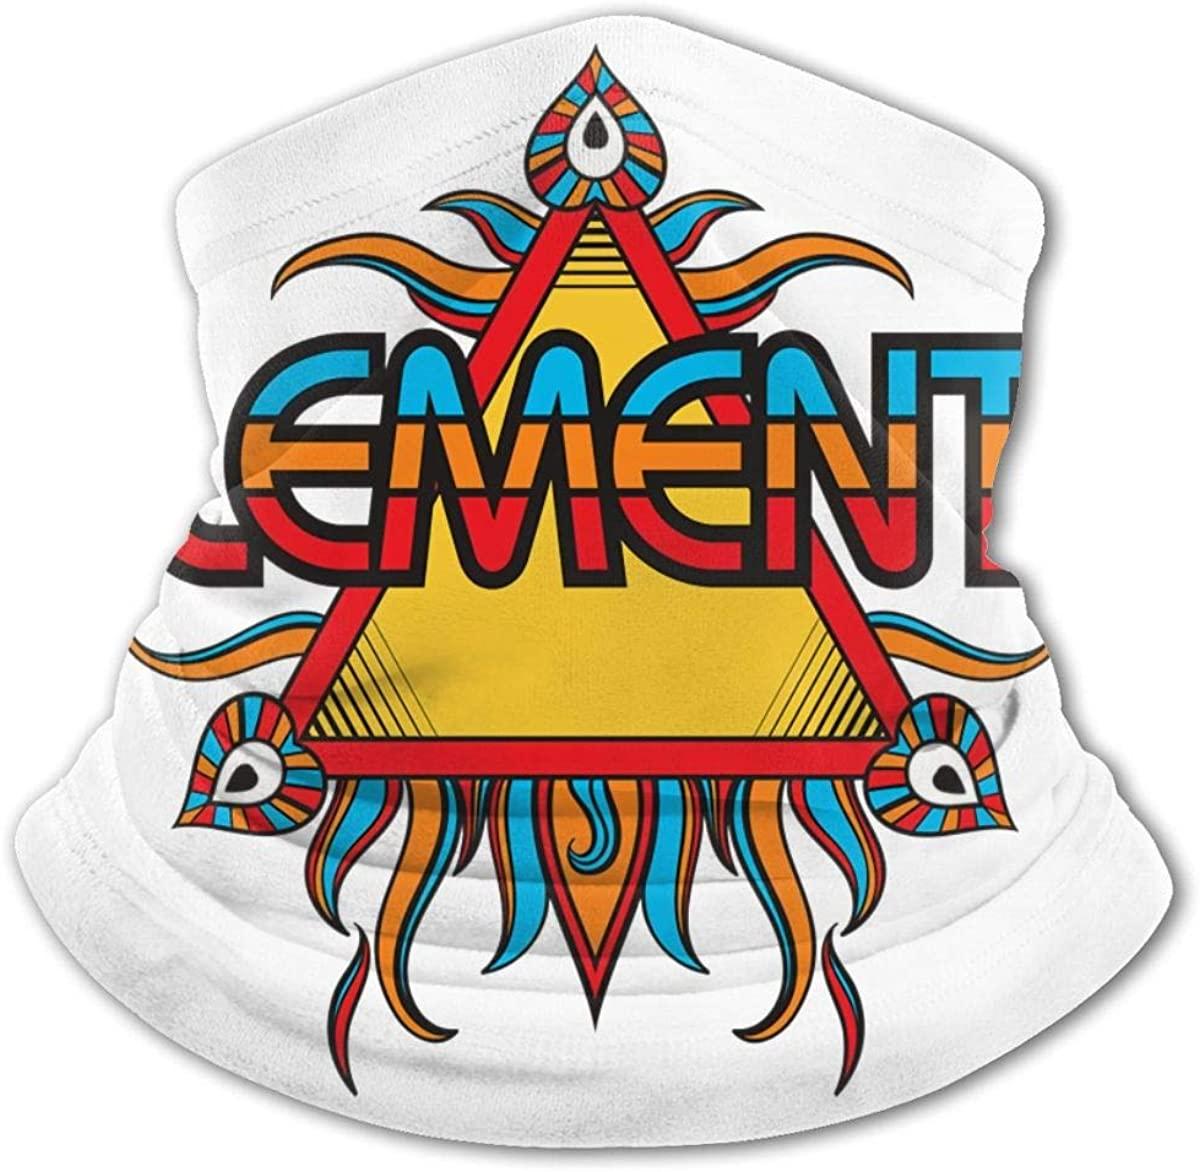 Earth Wind & Fire Face Mask Bandanas,Neck Gaiter,Headwear,Magic Scarf,Headband for Dust Sun Wind,Reusable Bandana Face Cover Black